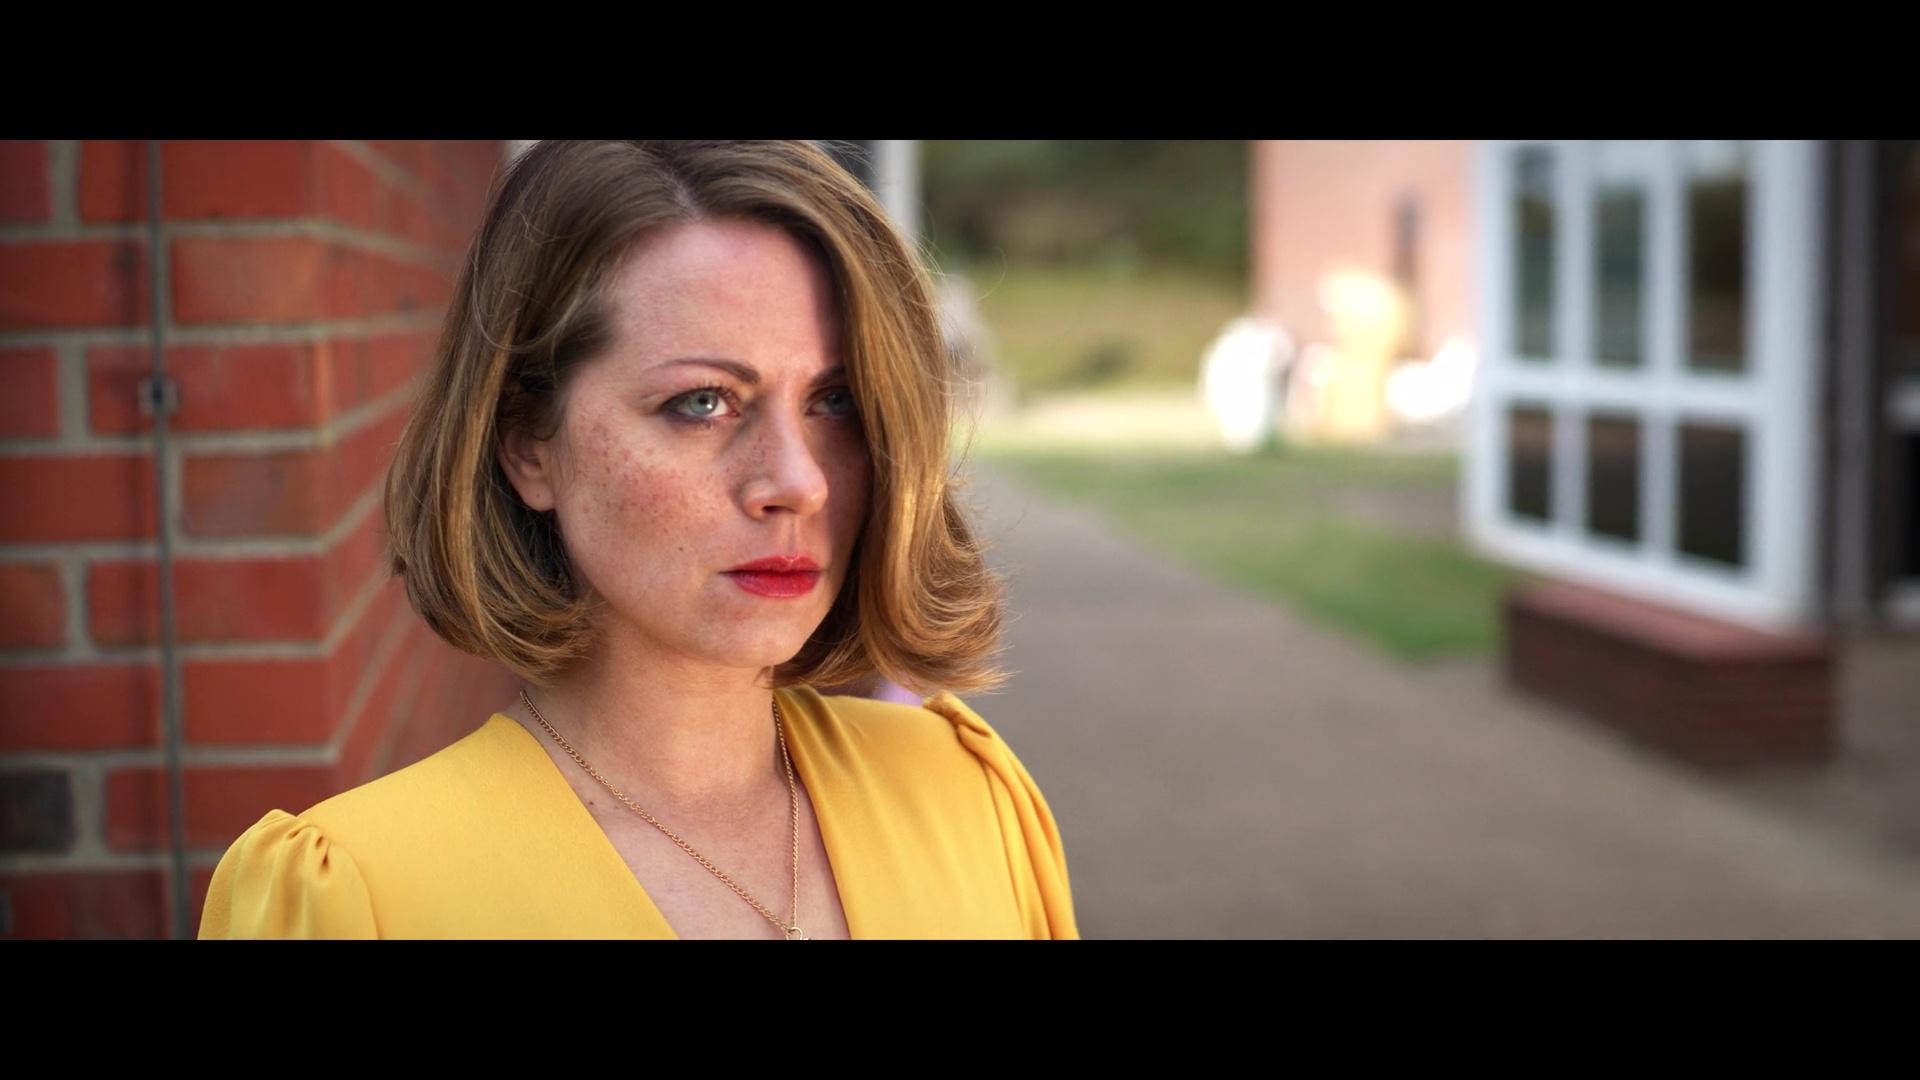 La isla negra (2021) 1080p WEB-DL Latino